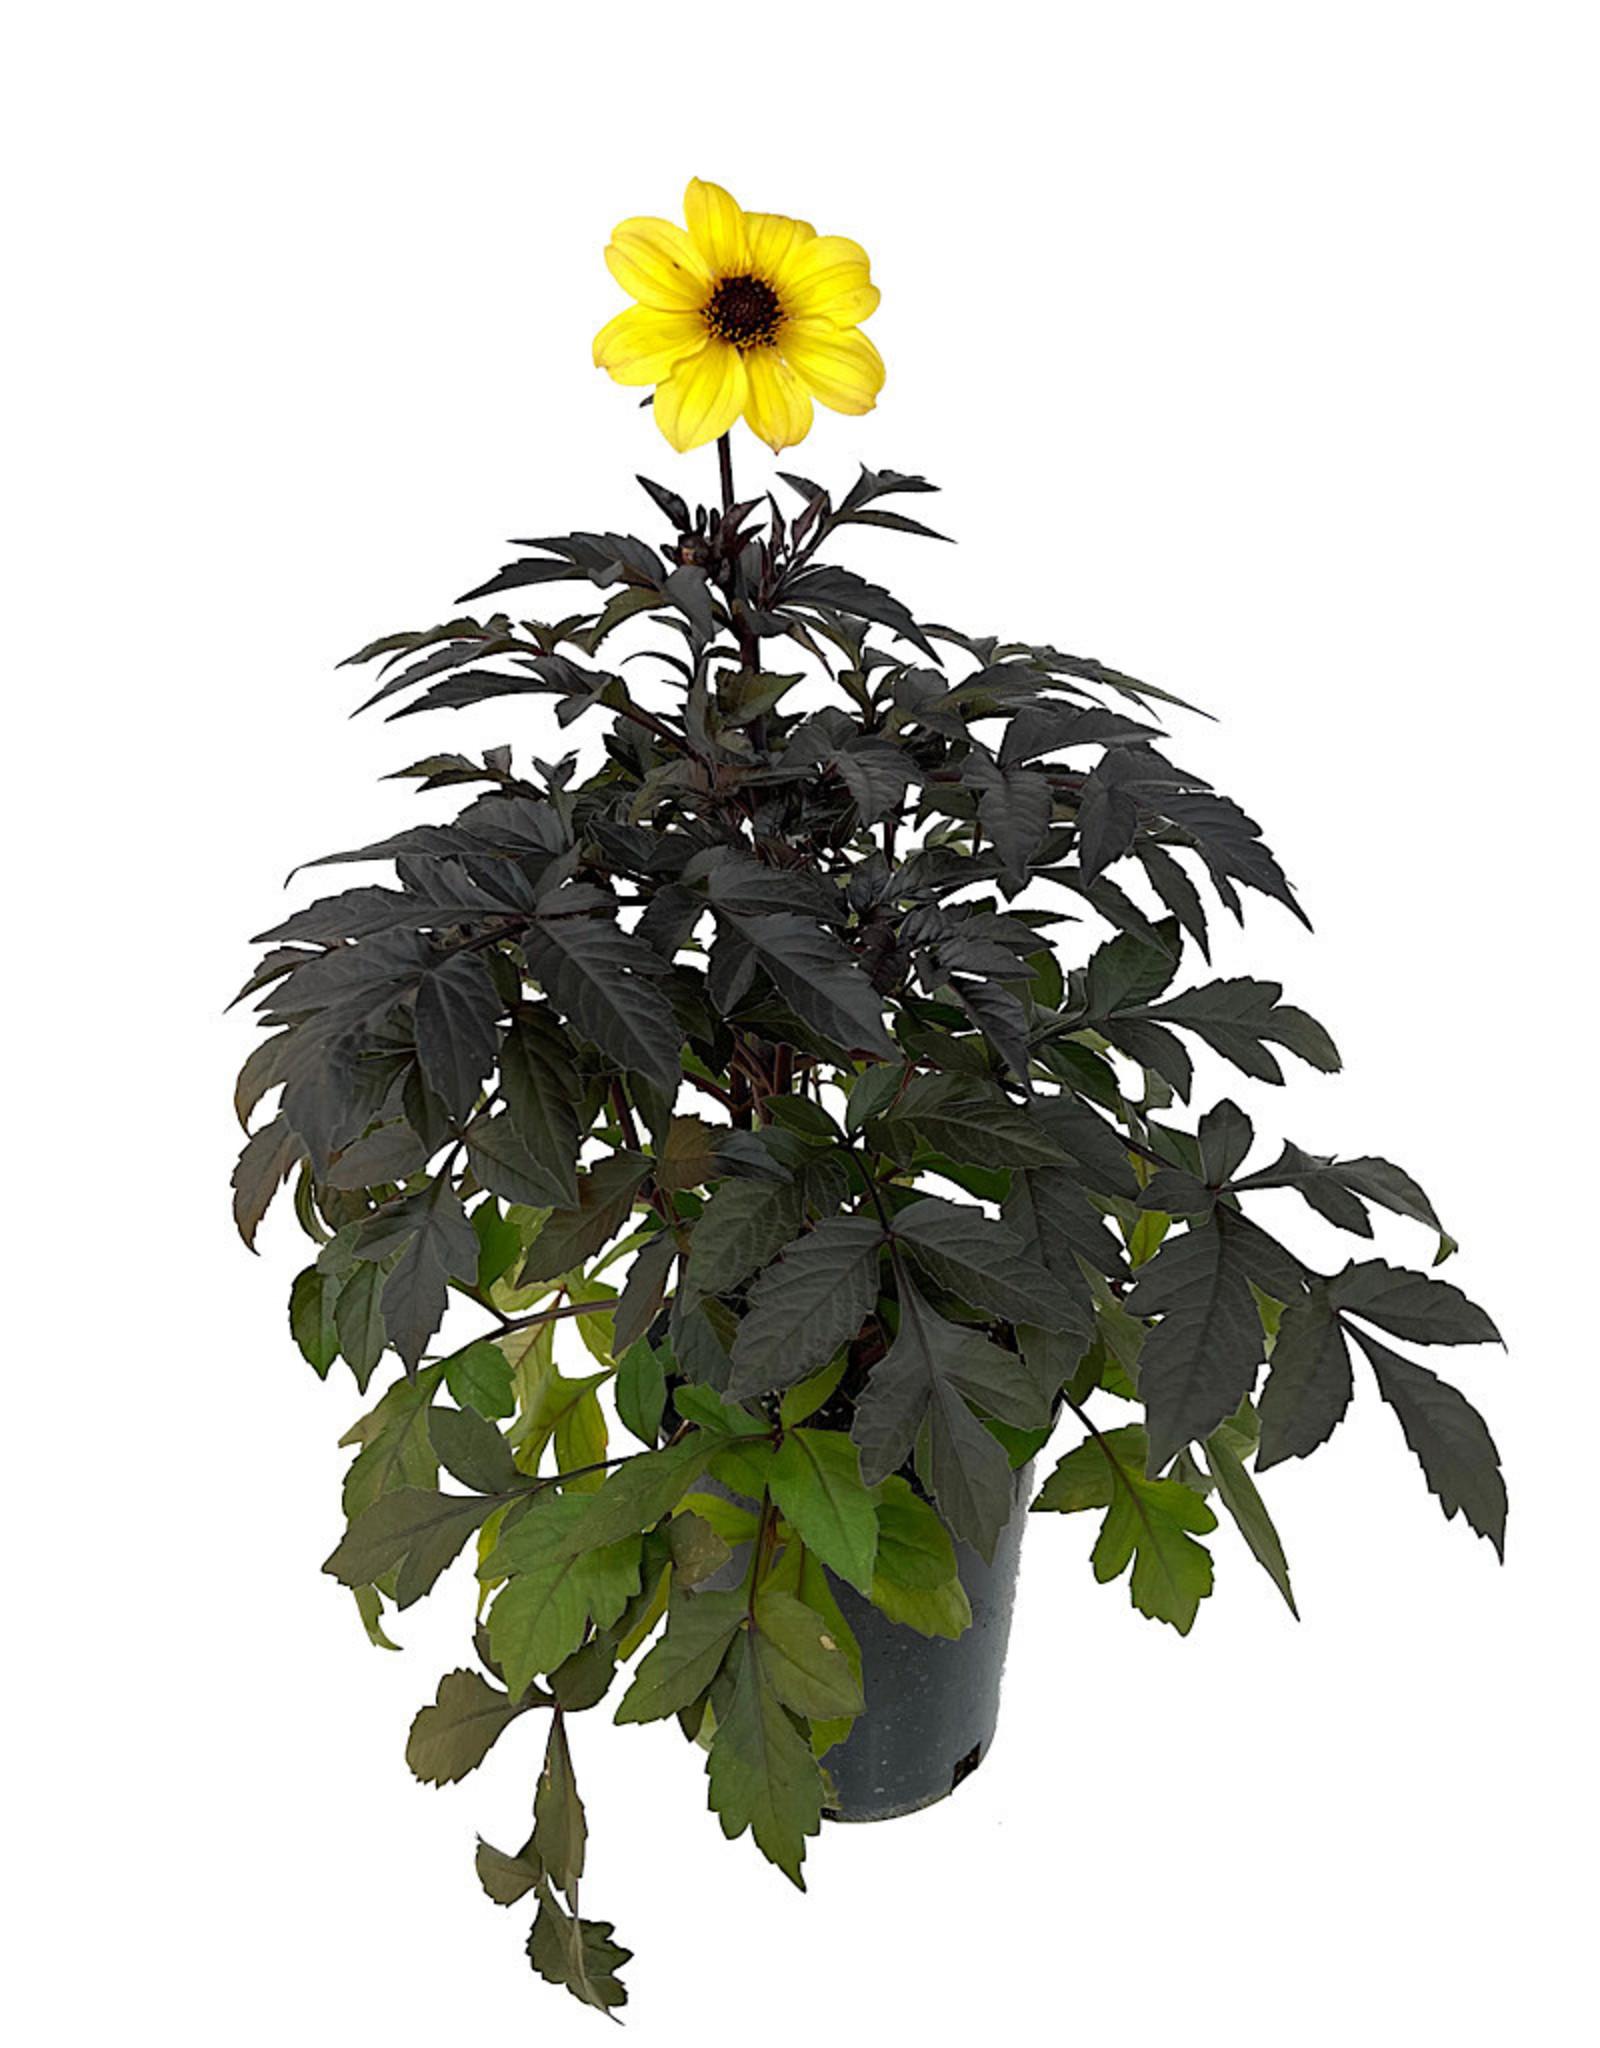 Dahlia 'Mystic Illusion Yellow' 1 Gallon